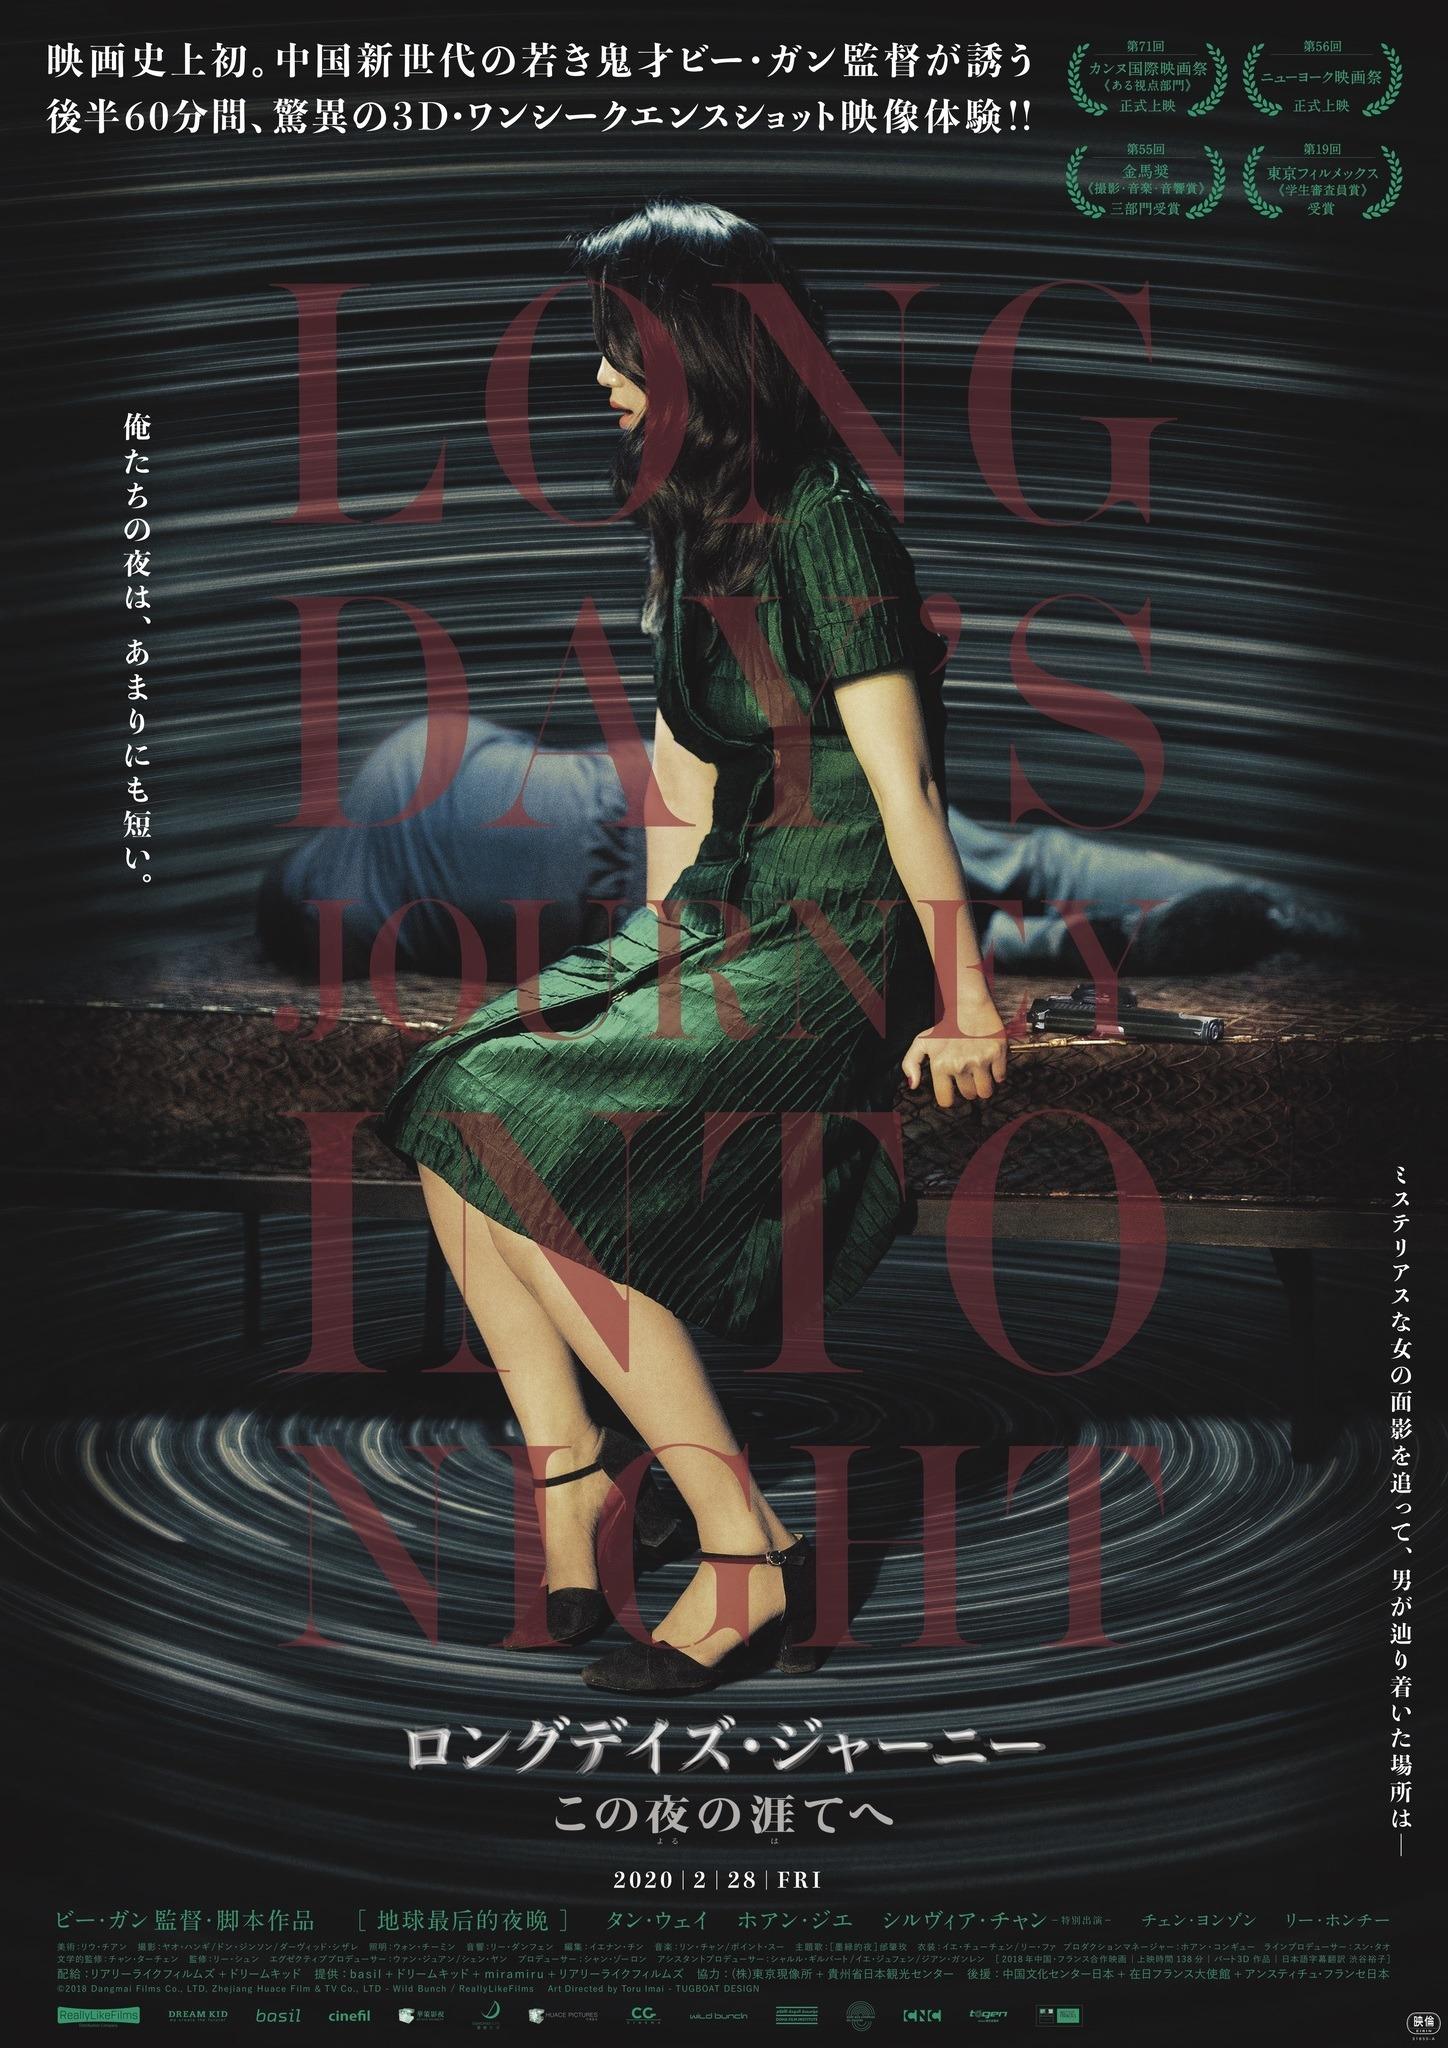 New Movie 期待の新作映画 リバイバル 特集上映 おしゃれまとめの人気アイデア Pinterest Tetsuya Yoshida 2020 新作映画 映画 映画祭